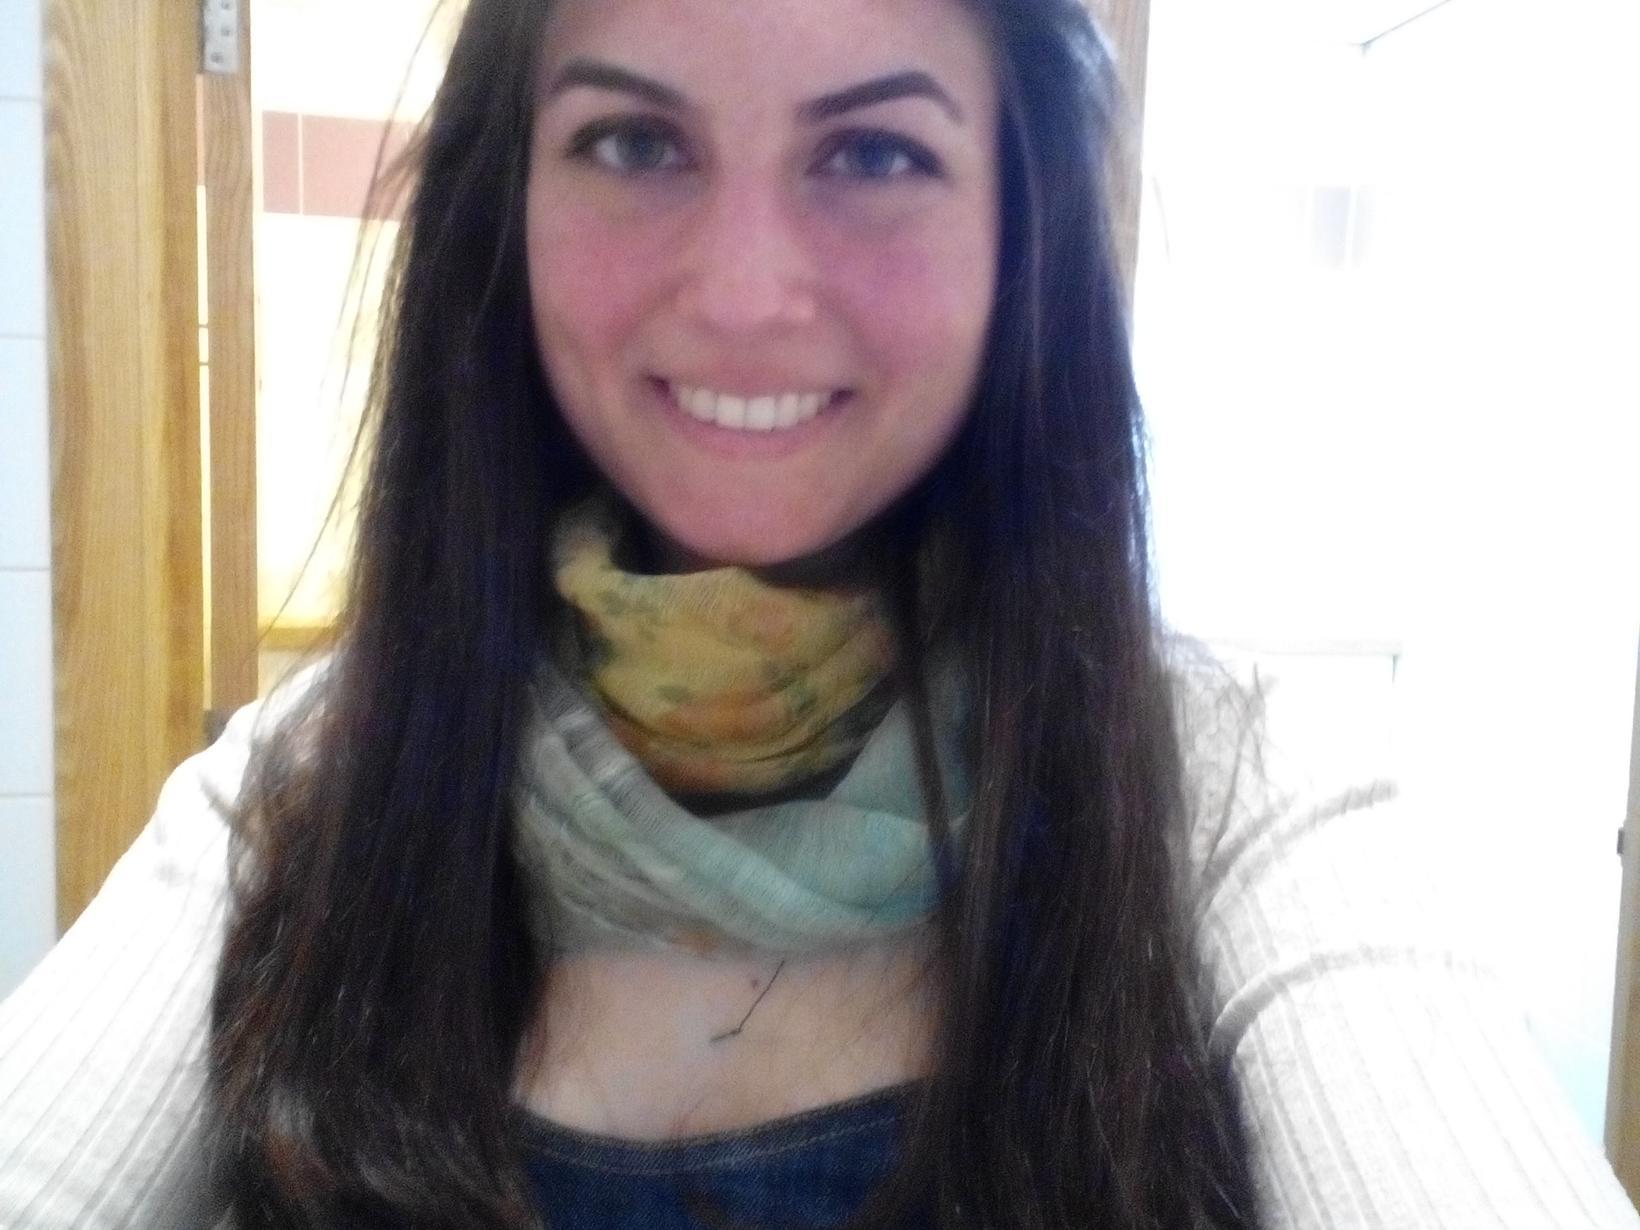 Raquel from Sydney, New South Wales, Australia